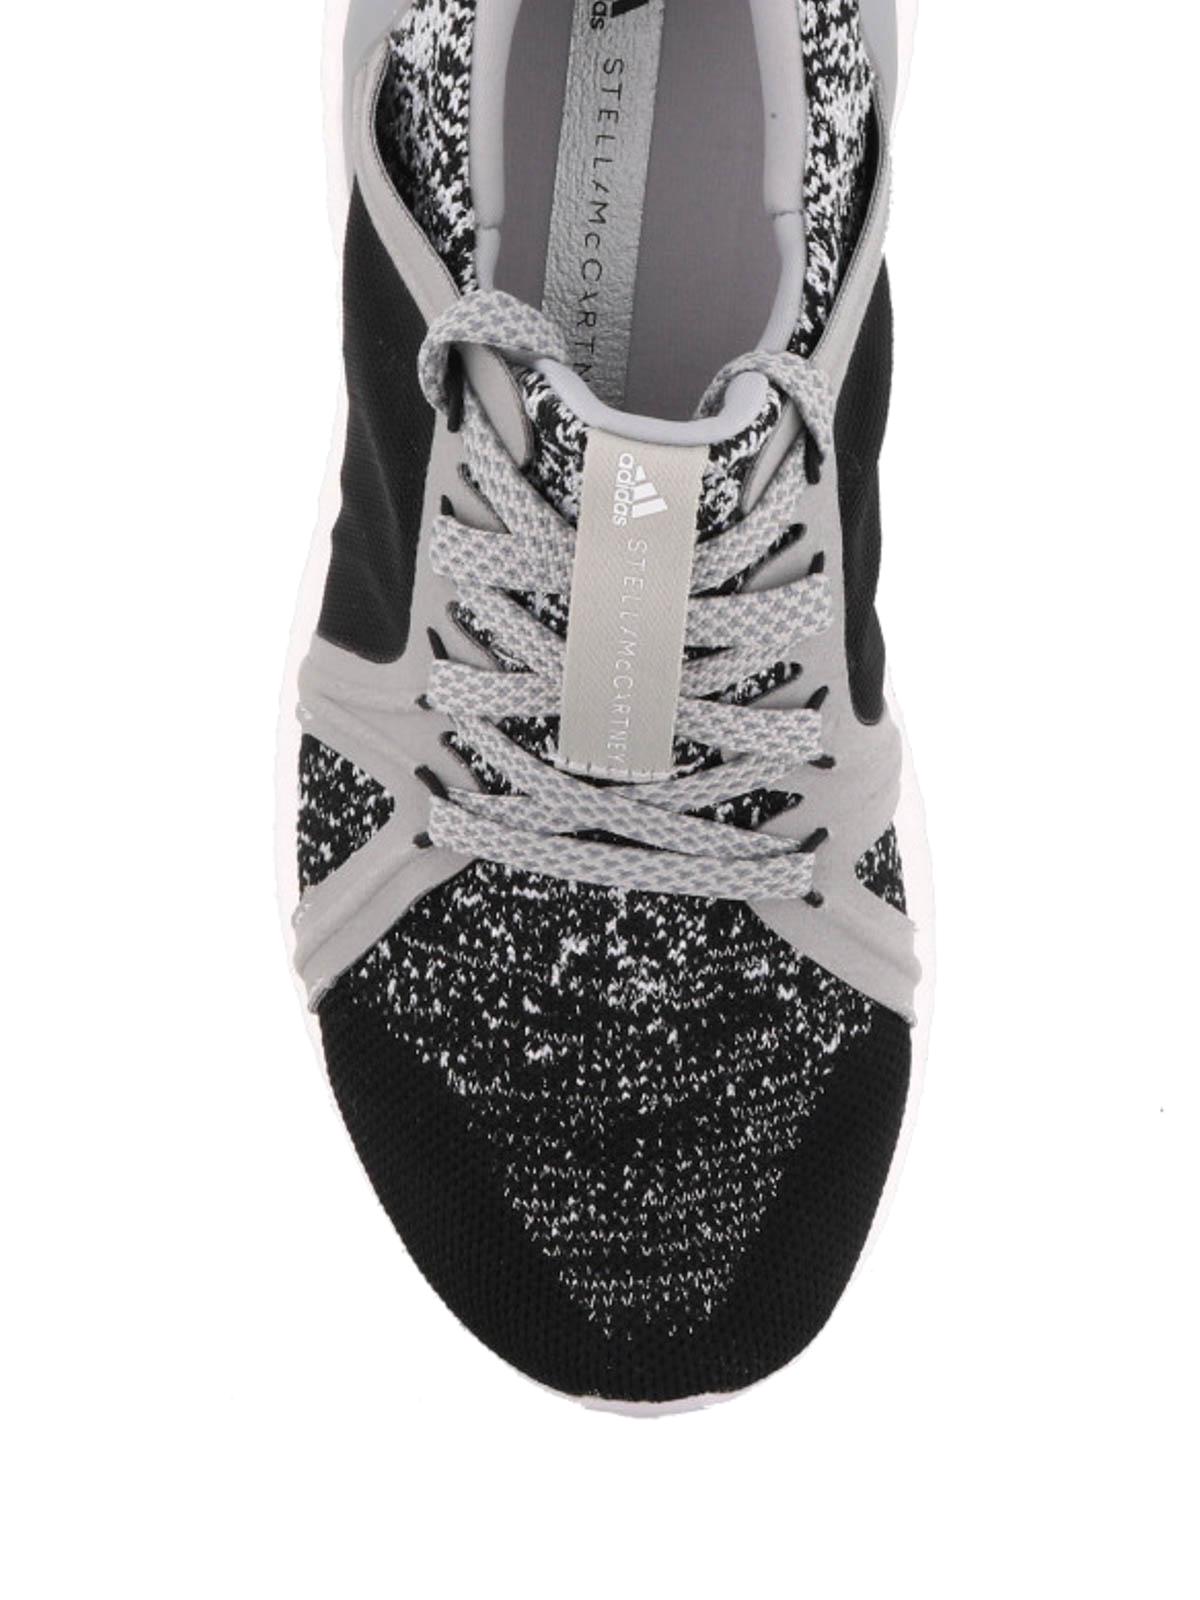 753ac4c54e1d3 iKRIX ADIDAS BY STELLA MCCARTNEY  trainers - Ultraboost grey sneakers